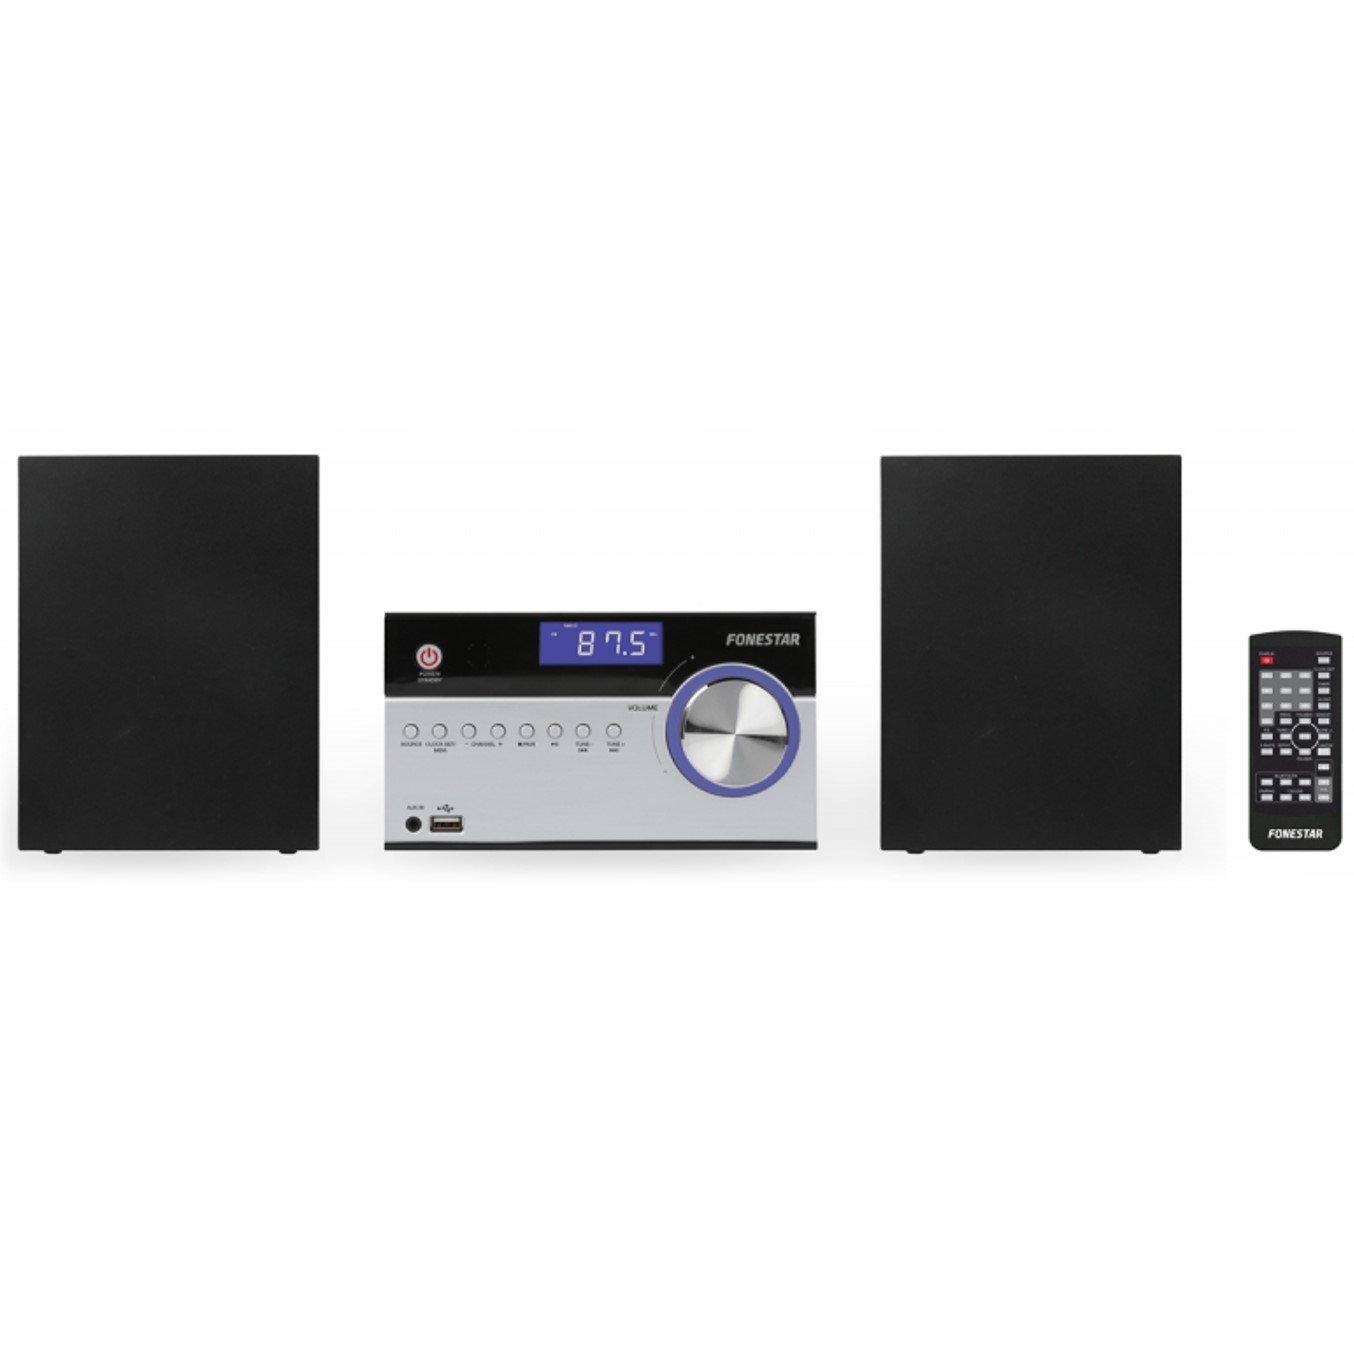 Micromusic 2x5w Plata Microcadena Bluetooth FONESTAR